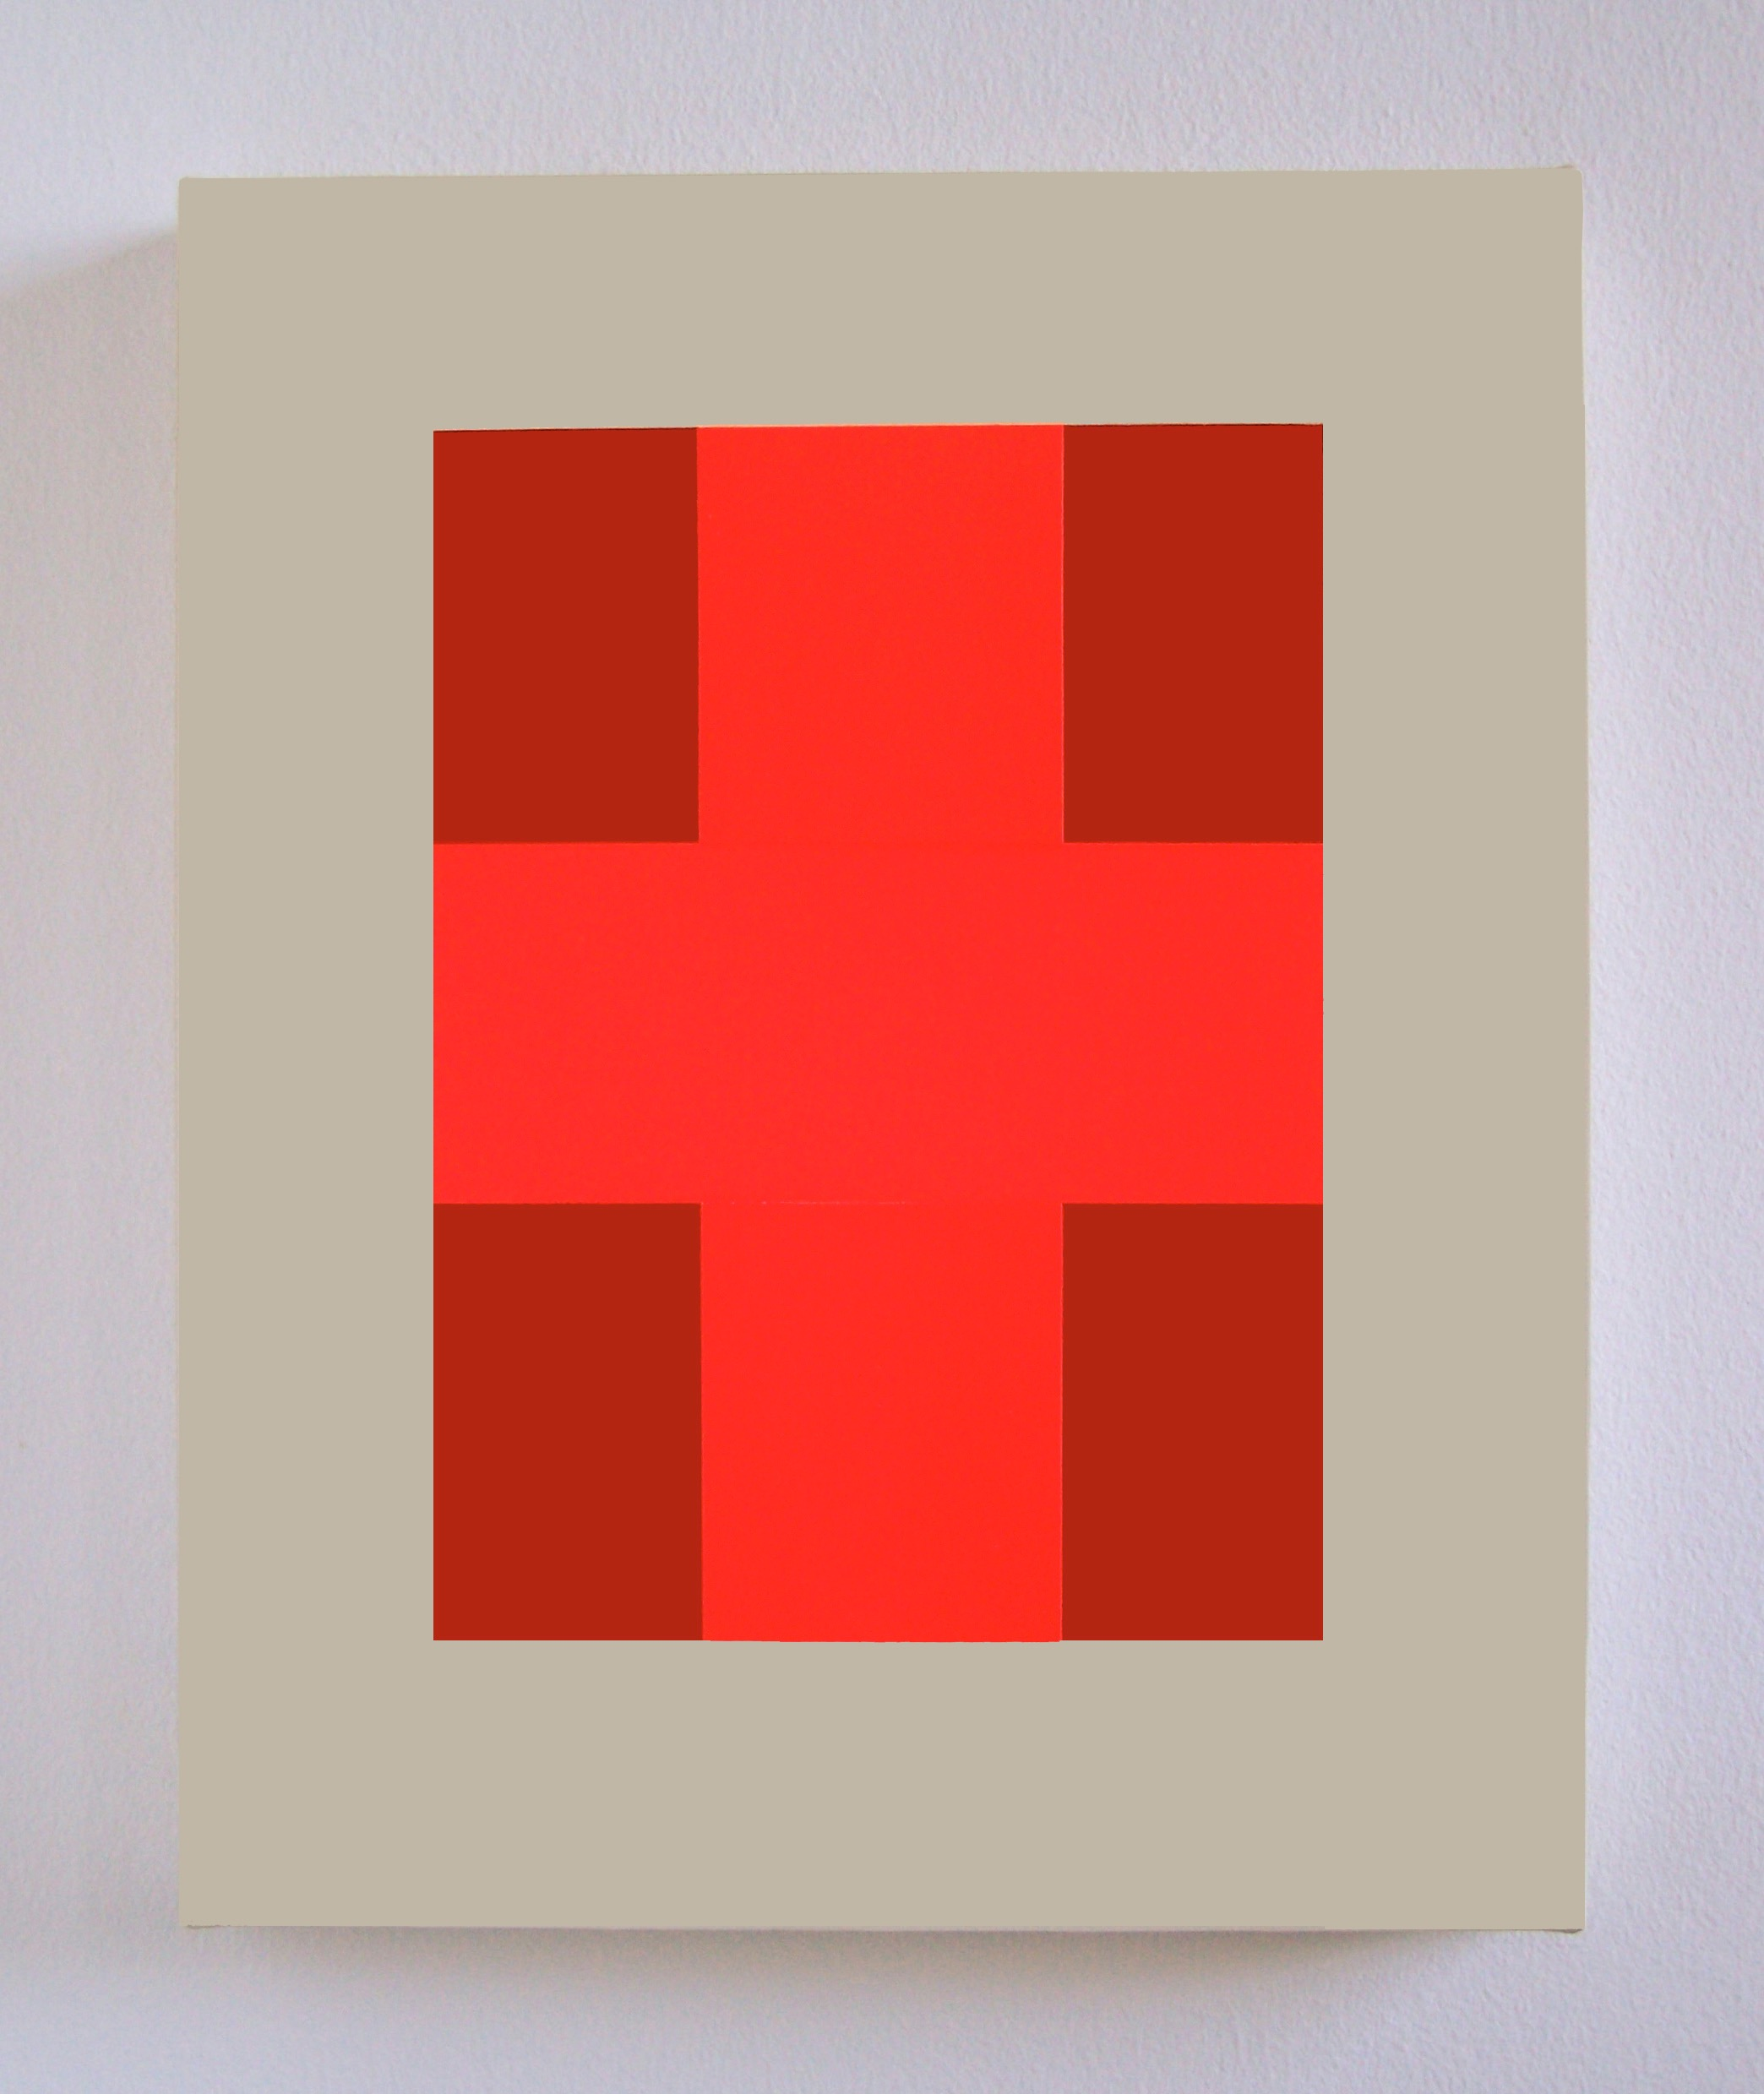 redcrossnc.jpg